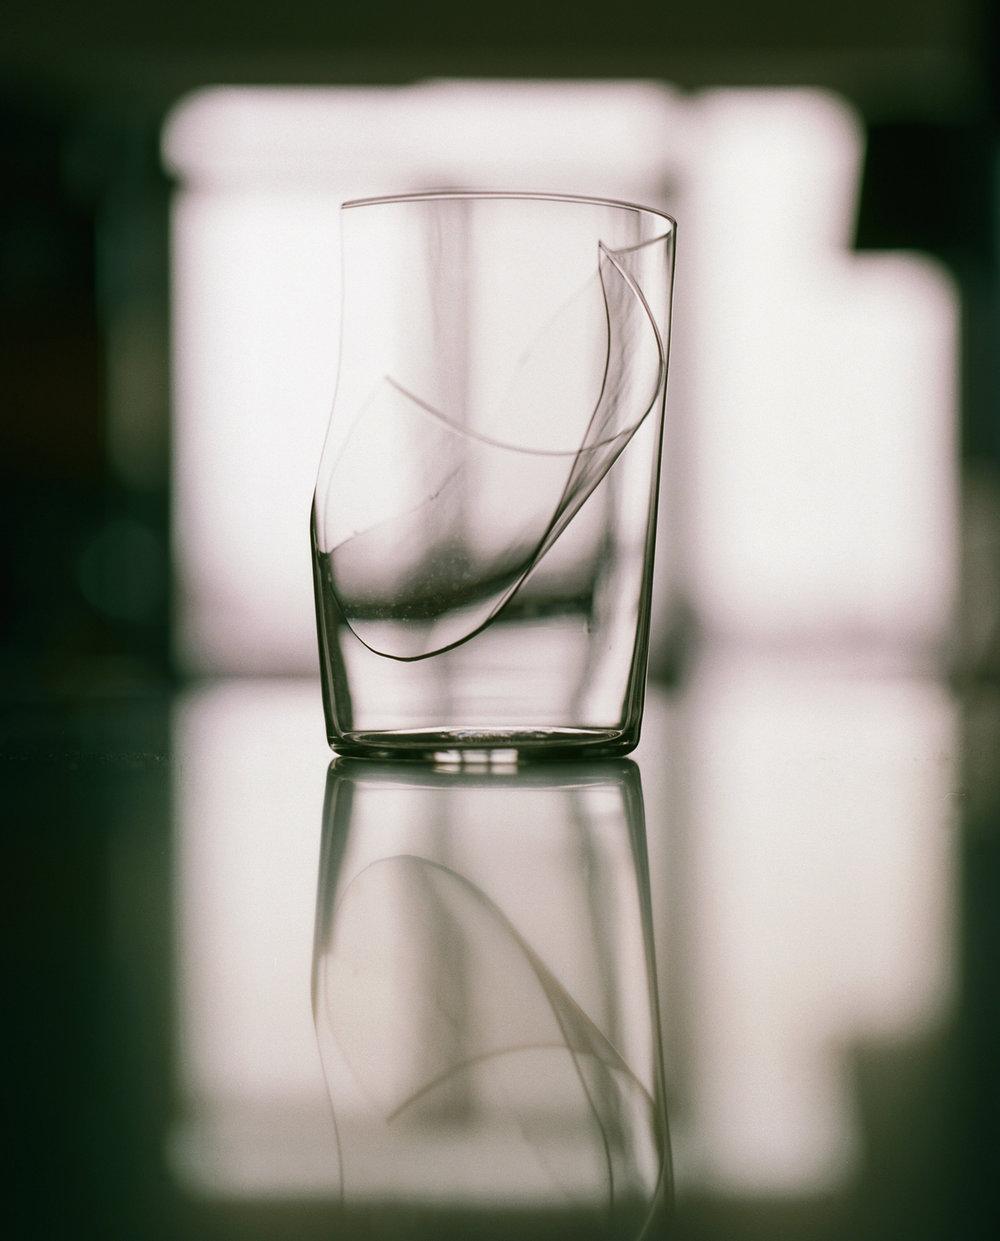 Broken Glass #5